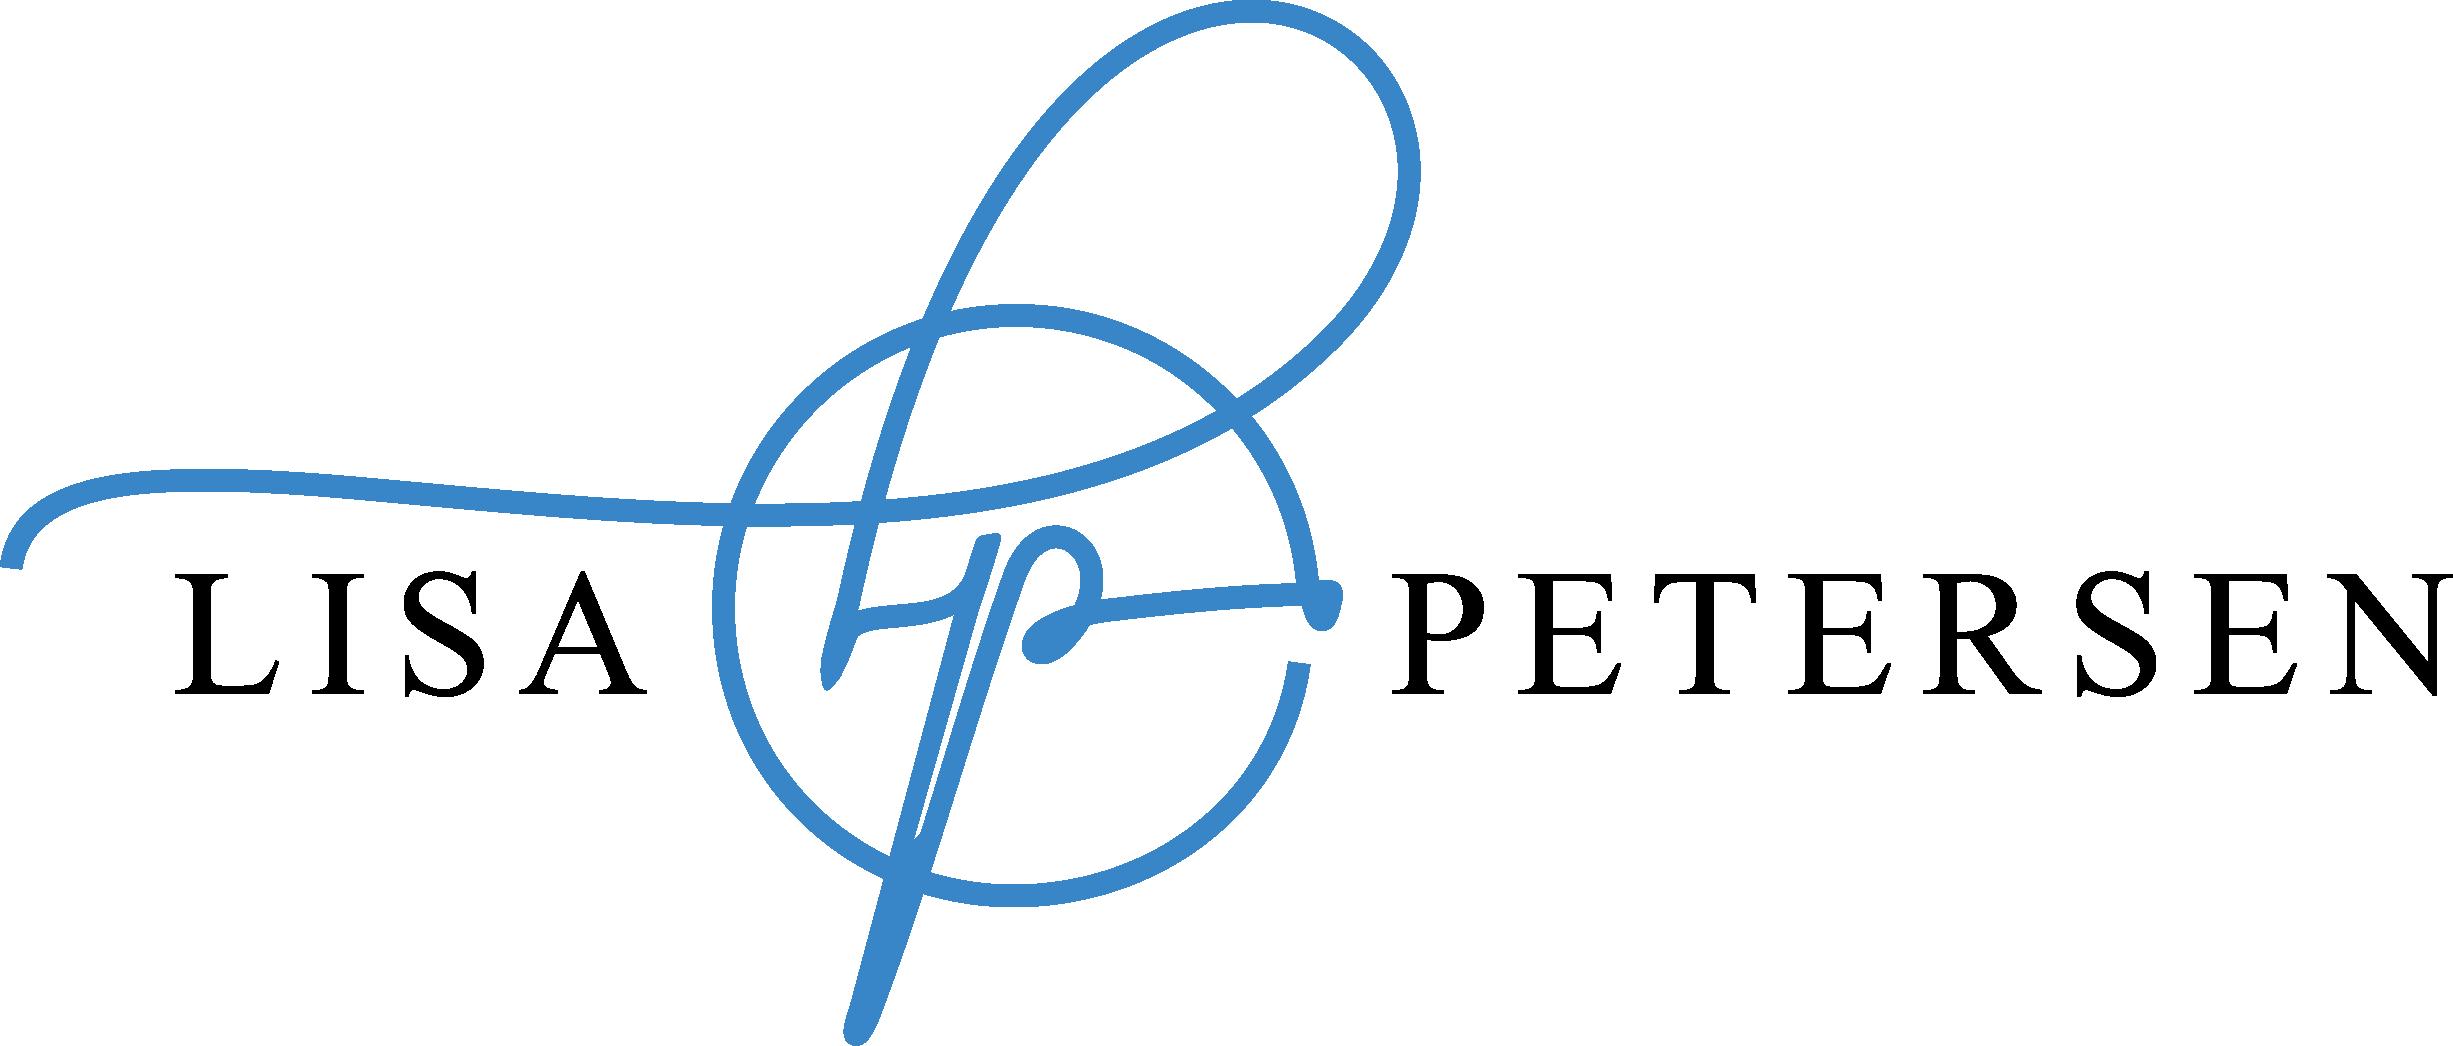 Powerful logo, classy and beautiful